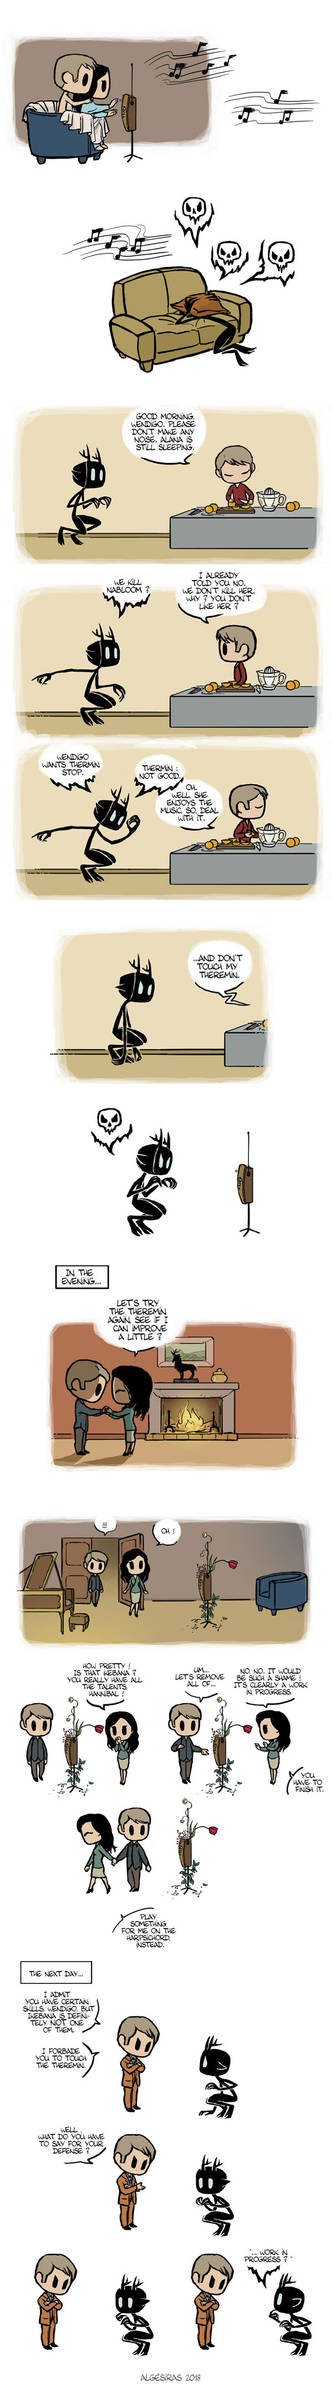 Pet Wendigo strip 30 - Ikebana